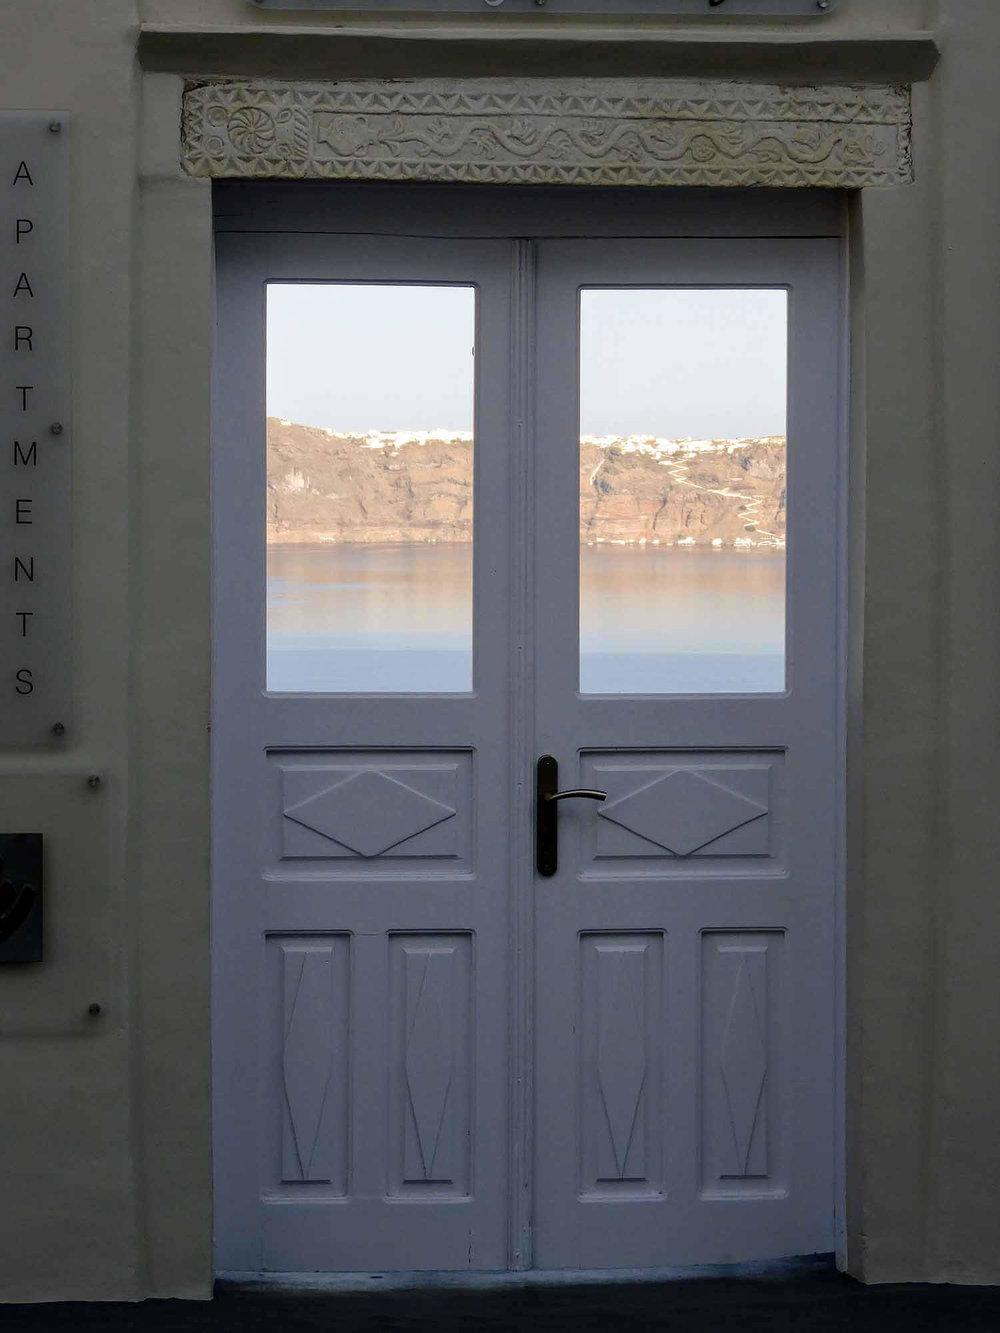 greece-santorini-fira-doors.jpg